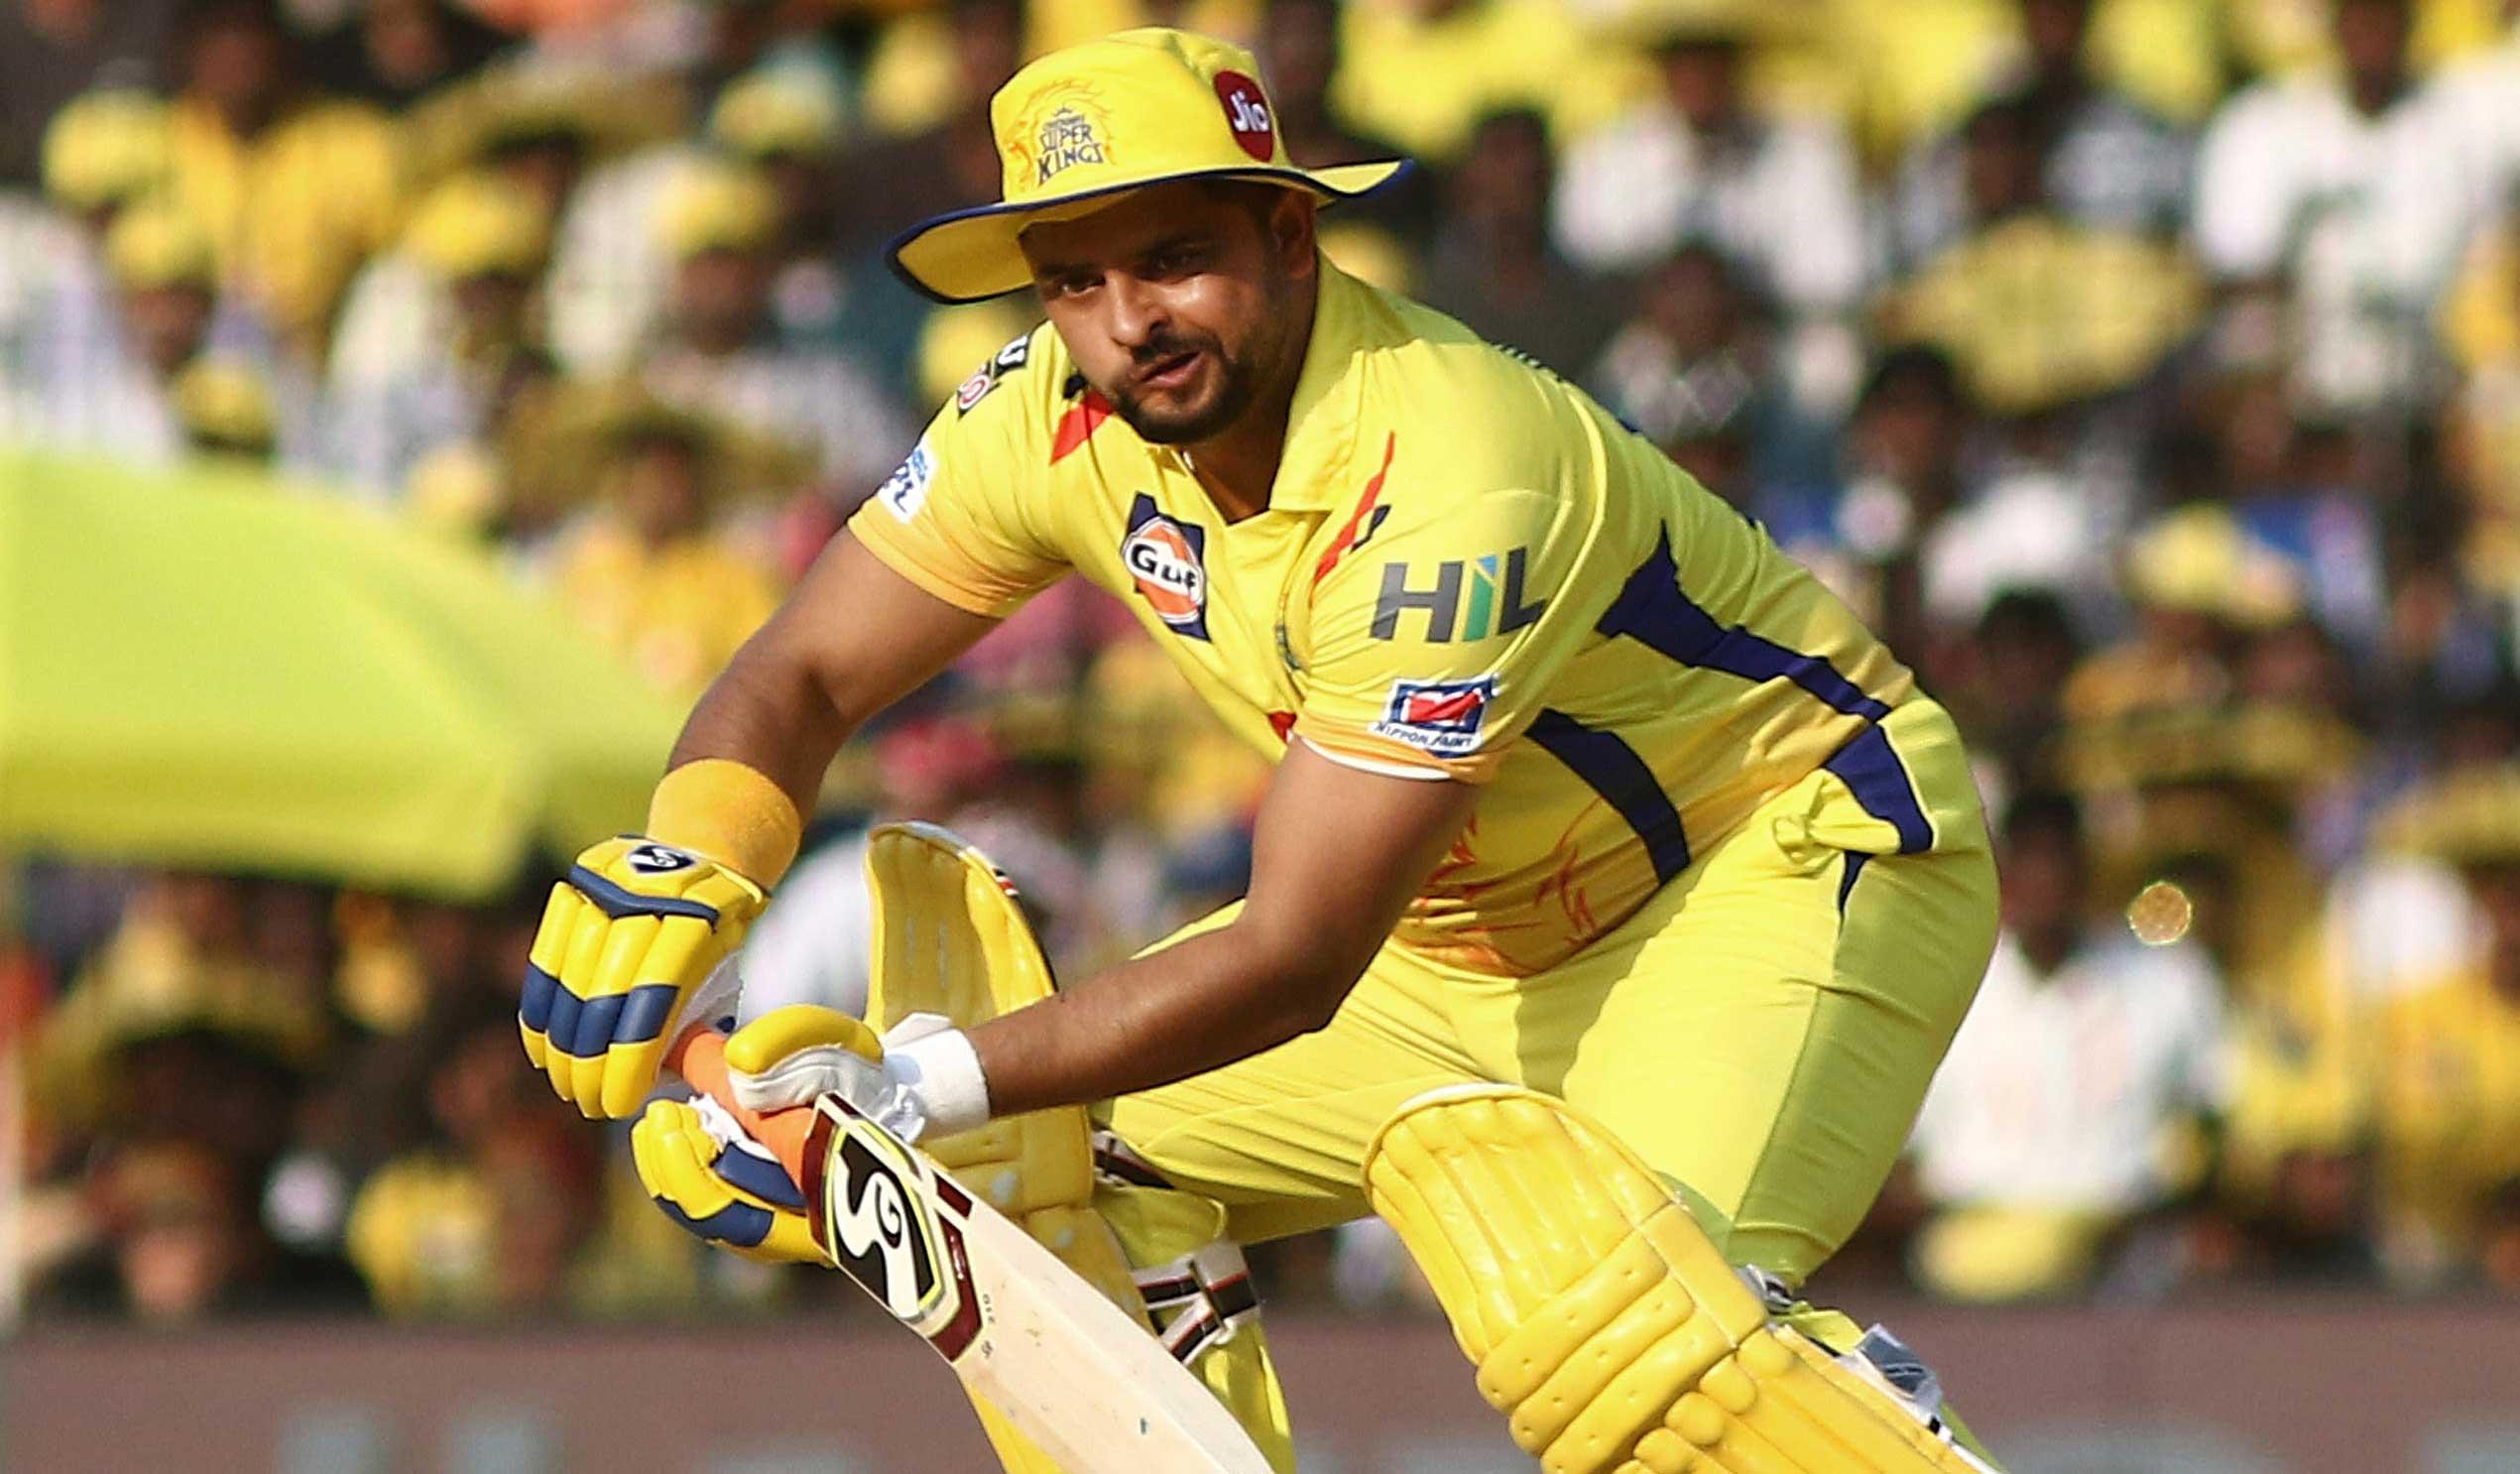 Suresh Raina plays a shot during the IPL T20 cricket match between Chennai Super Kings and Kings XI Punjab in Chennai, on April 6, 2019.